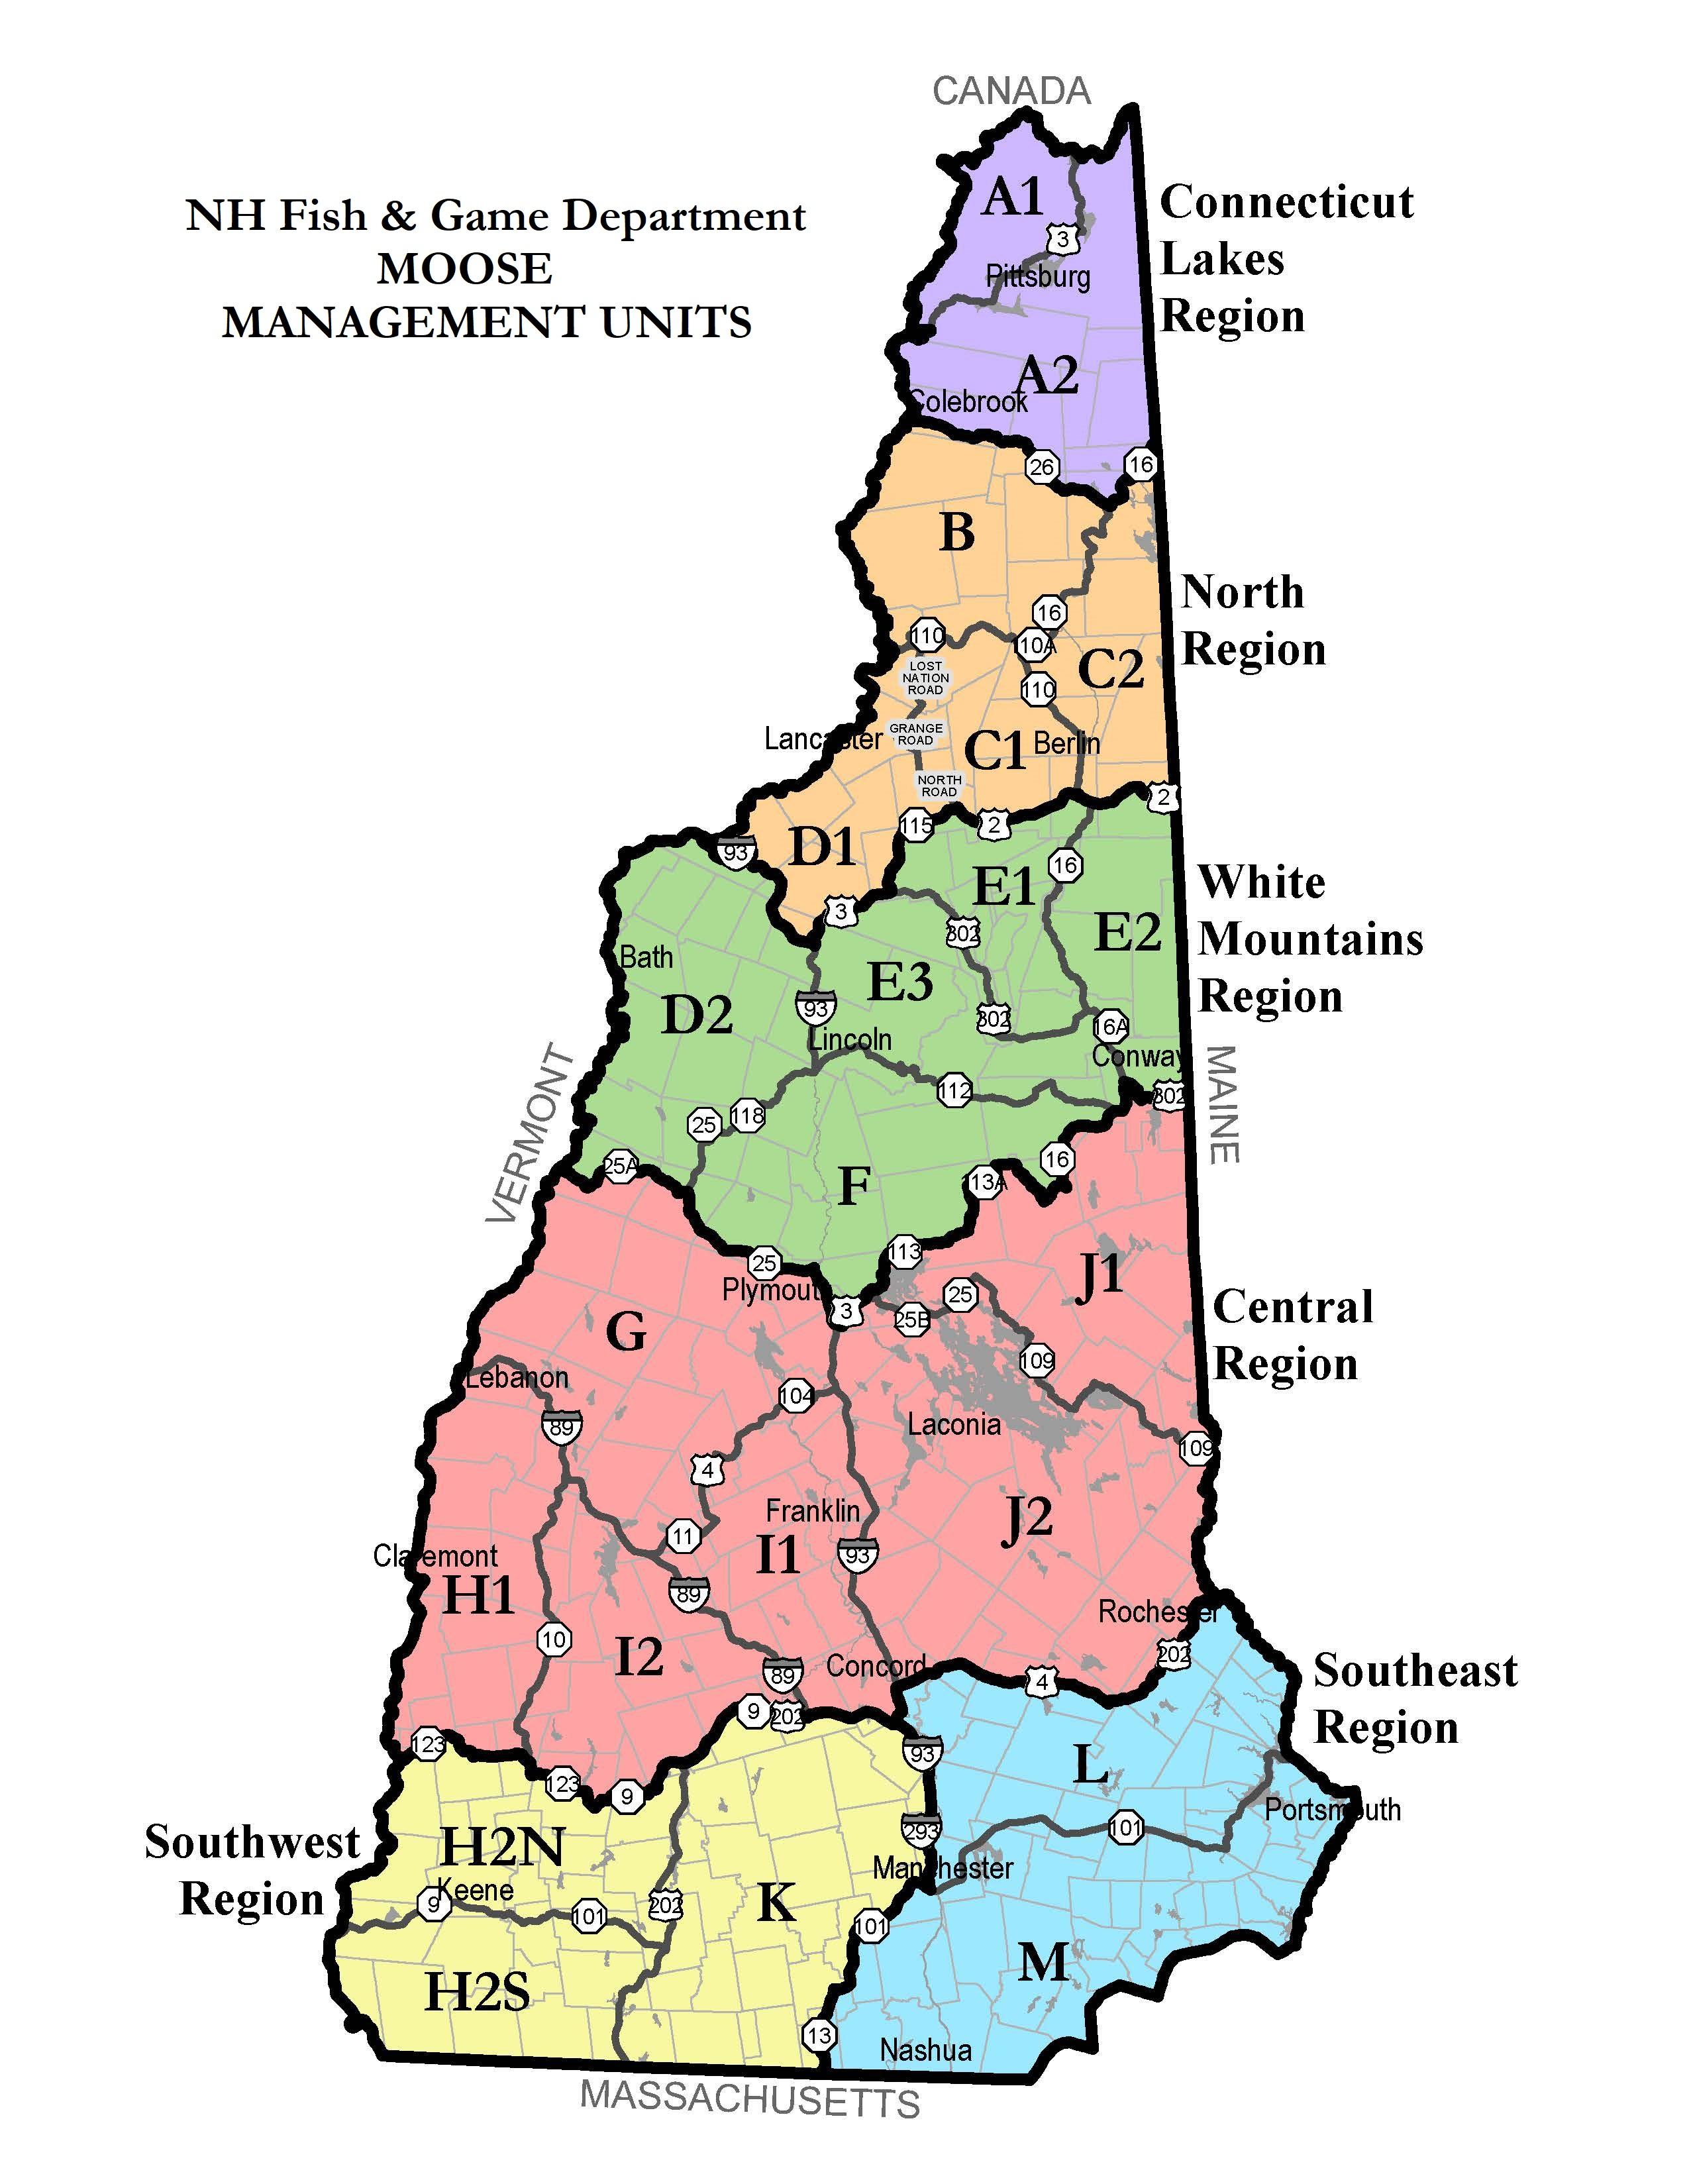 NH Moose Hunting Units Map   Hunting   New Hampshire Fish ... on map of southern new hampshire, map of strafford county new hampshire, map of wolfeboro new hampshire, map of kentucky, map of maryland, map of new hampshire towns, map of cheshire county new hampshire, map of cl, map of white mountains, map of connecticut, map of gh, map of vt, map of ny, map of ma, map of me, map of charlestown new hampshire, map of nm, map of great north woods, map of canada, map of nc,